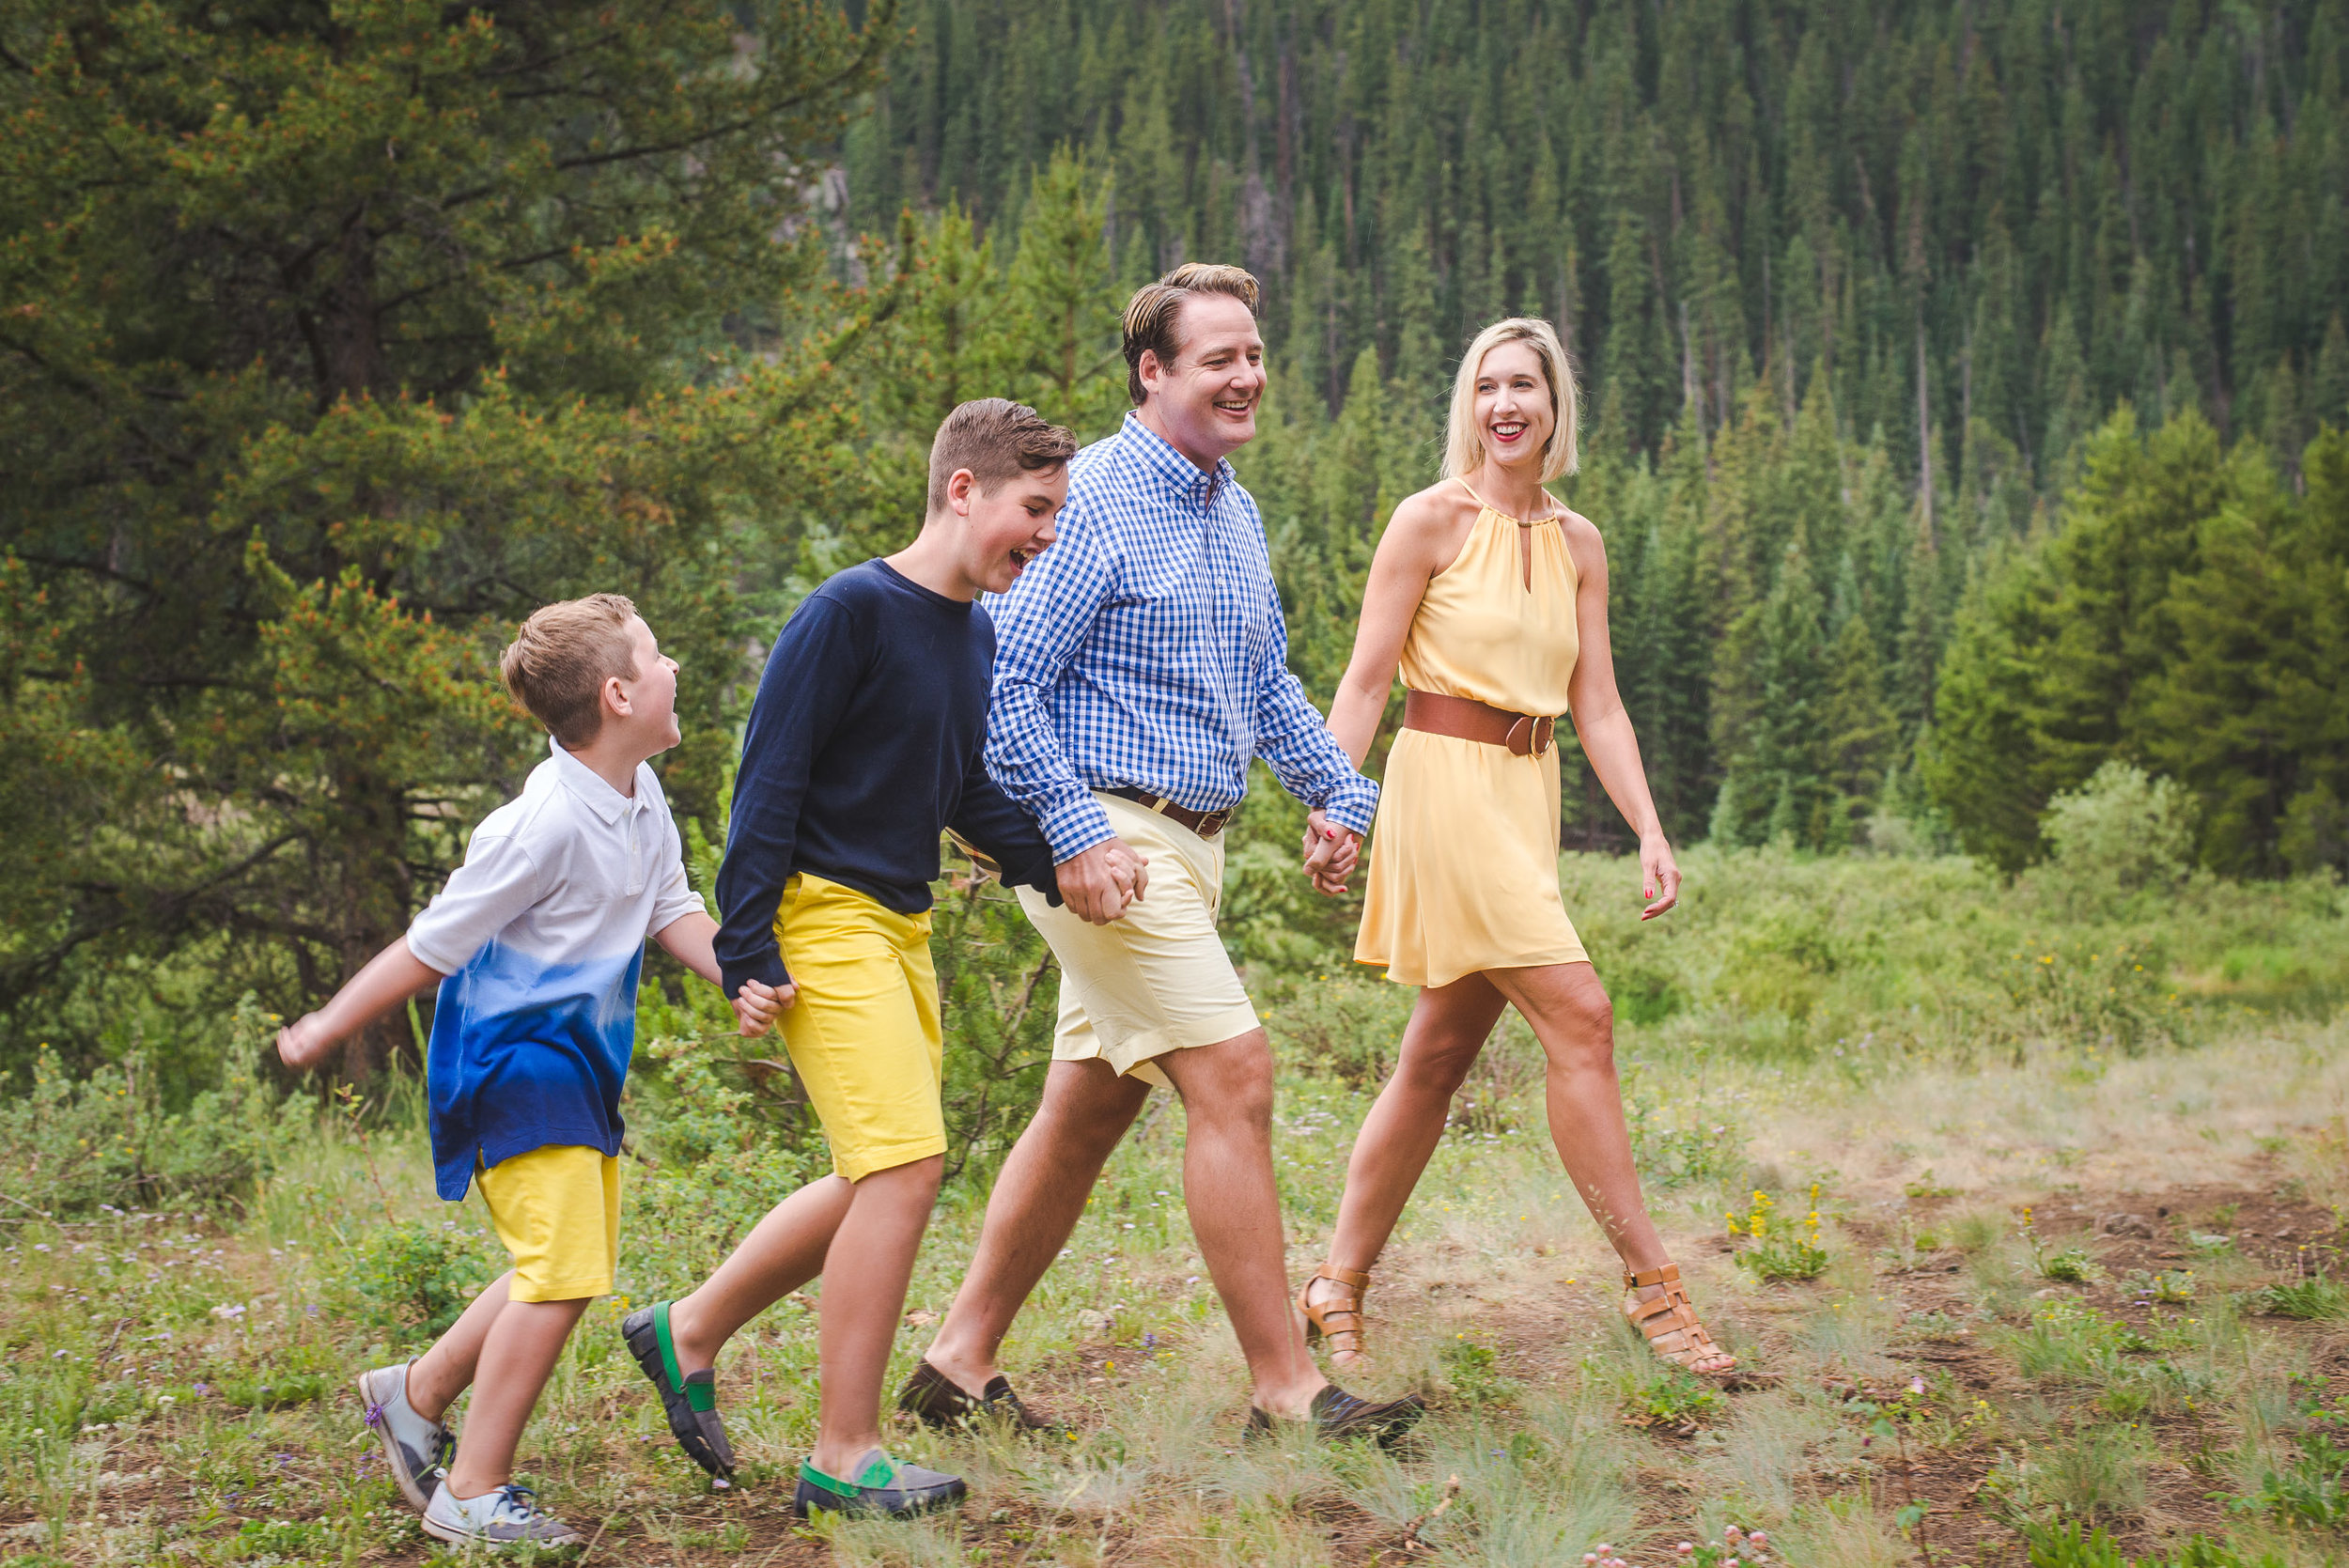 Keystone, Colorado summer family portraits | Keeping Composure Photography